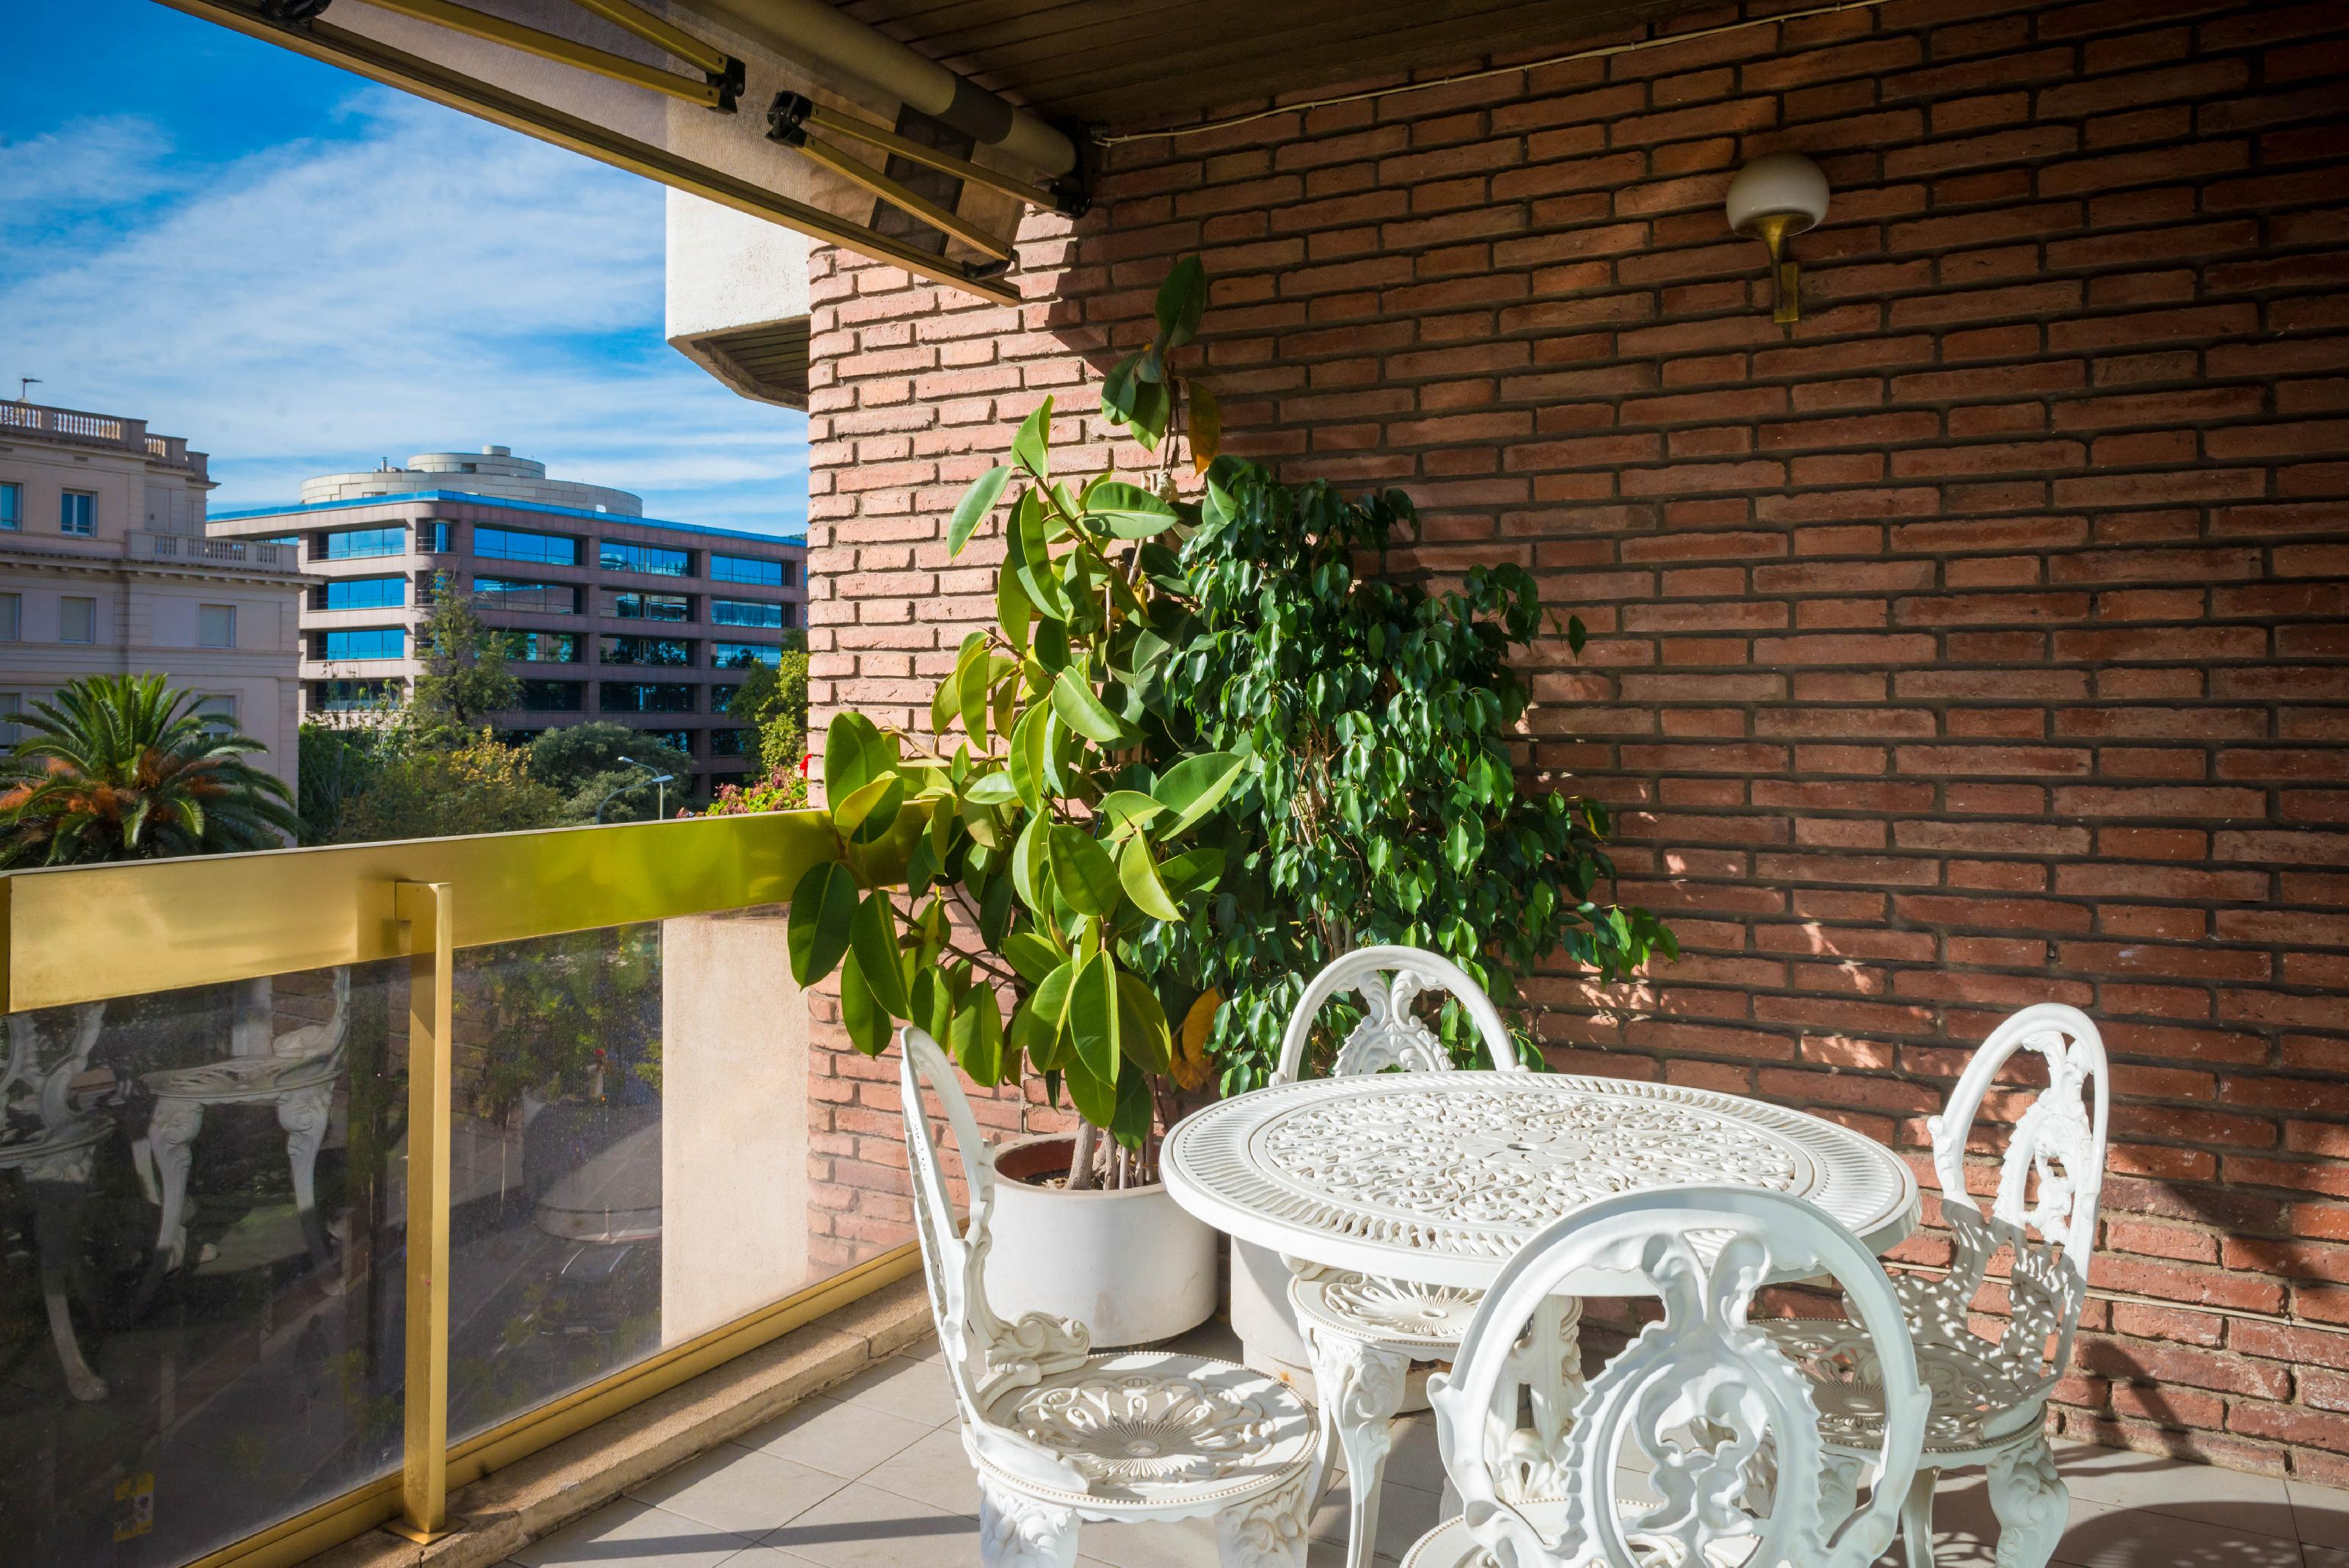 253899 Flat for sale in Sarrià-Sant Gervasi, Sant Gervasi-Galvany 7